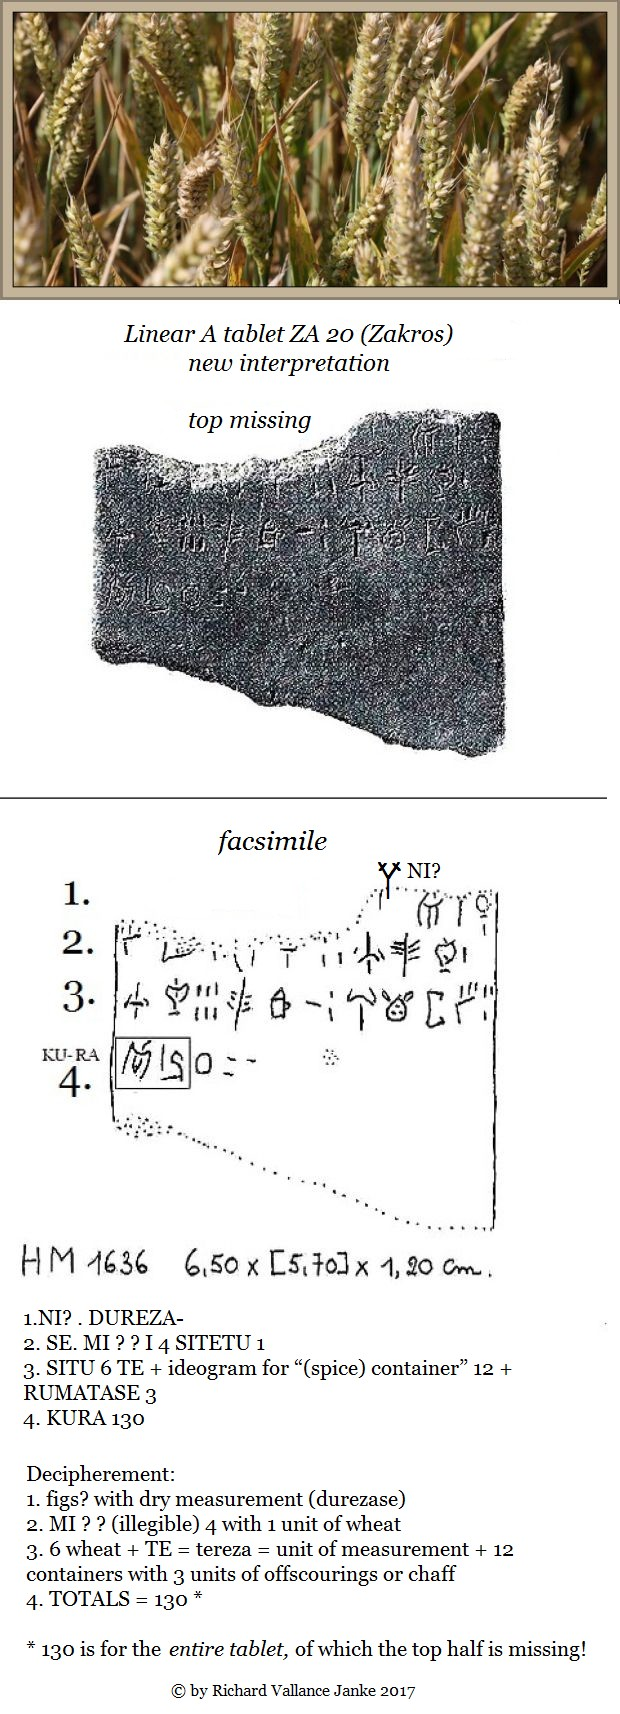 Linear A tablet ZA 20 HM 1636 Zakros